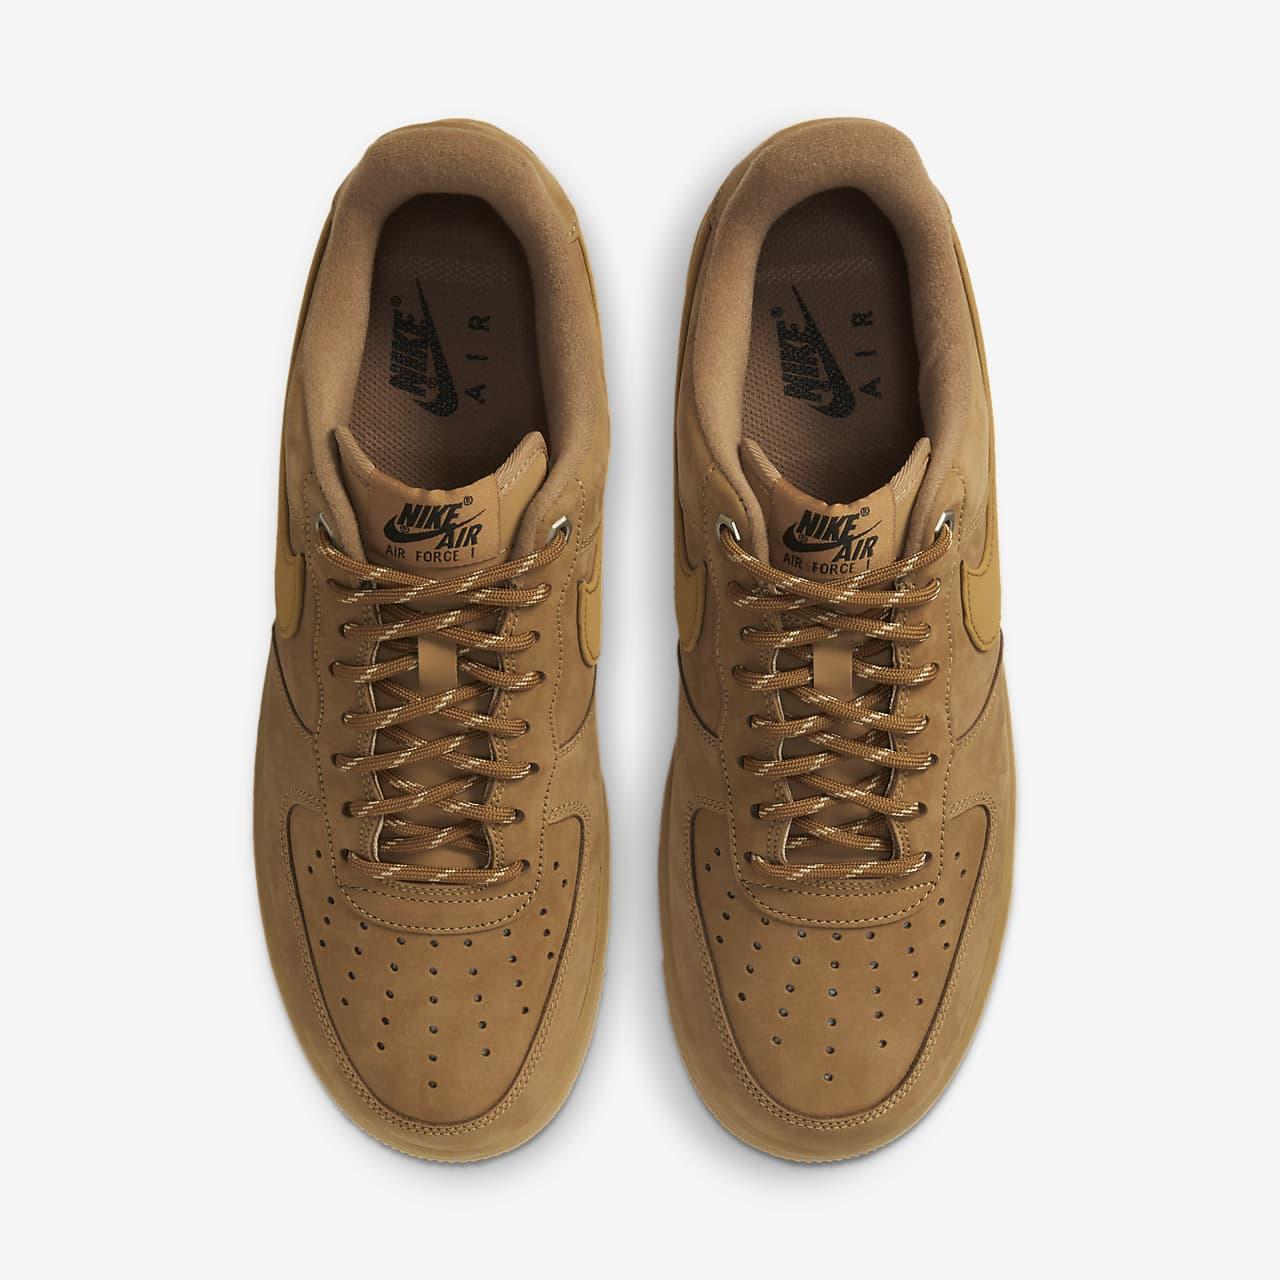 Shoes Nike Air Force 1 07 WB Flax • shop